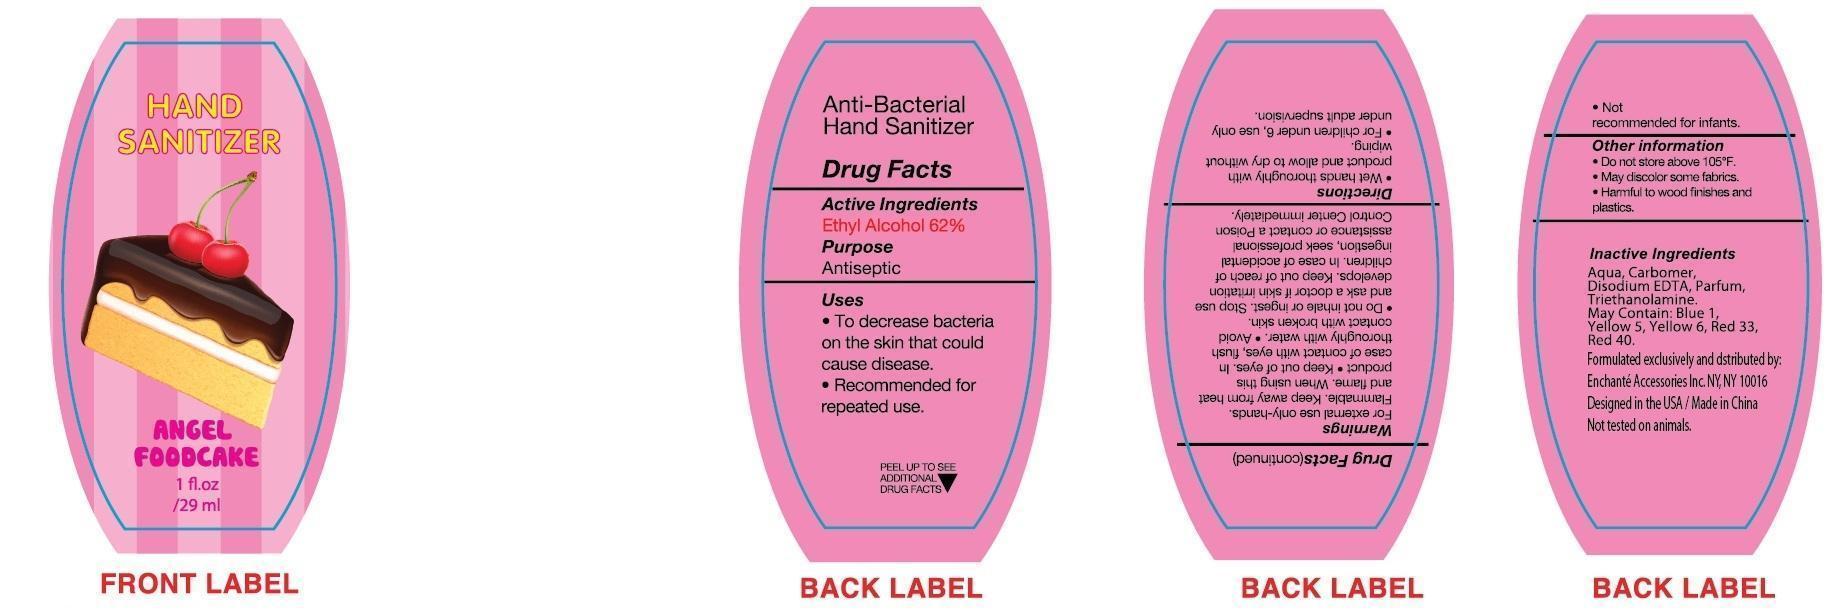 Angel Foodcake Hand Sanitizer (Alcohol) Liquid [Enchante Accessories Inc. ]